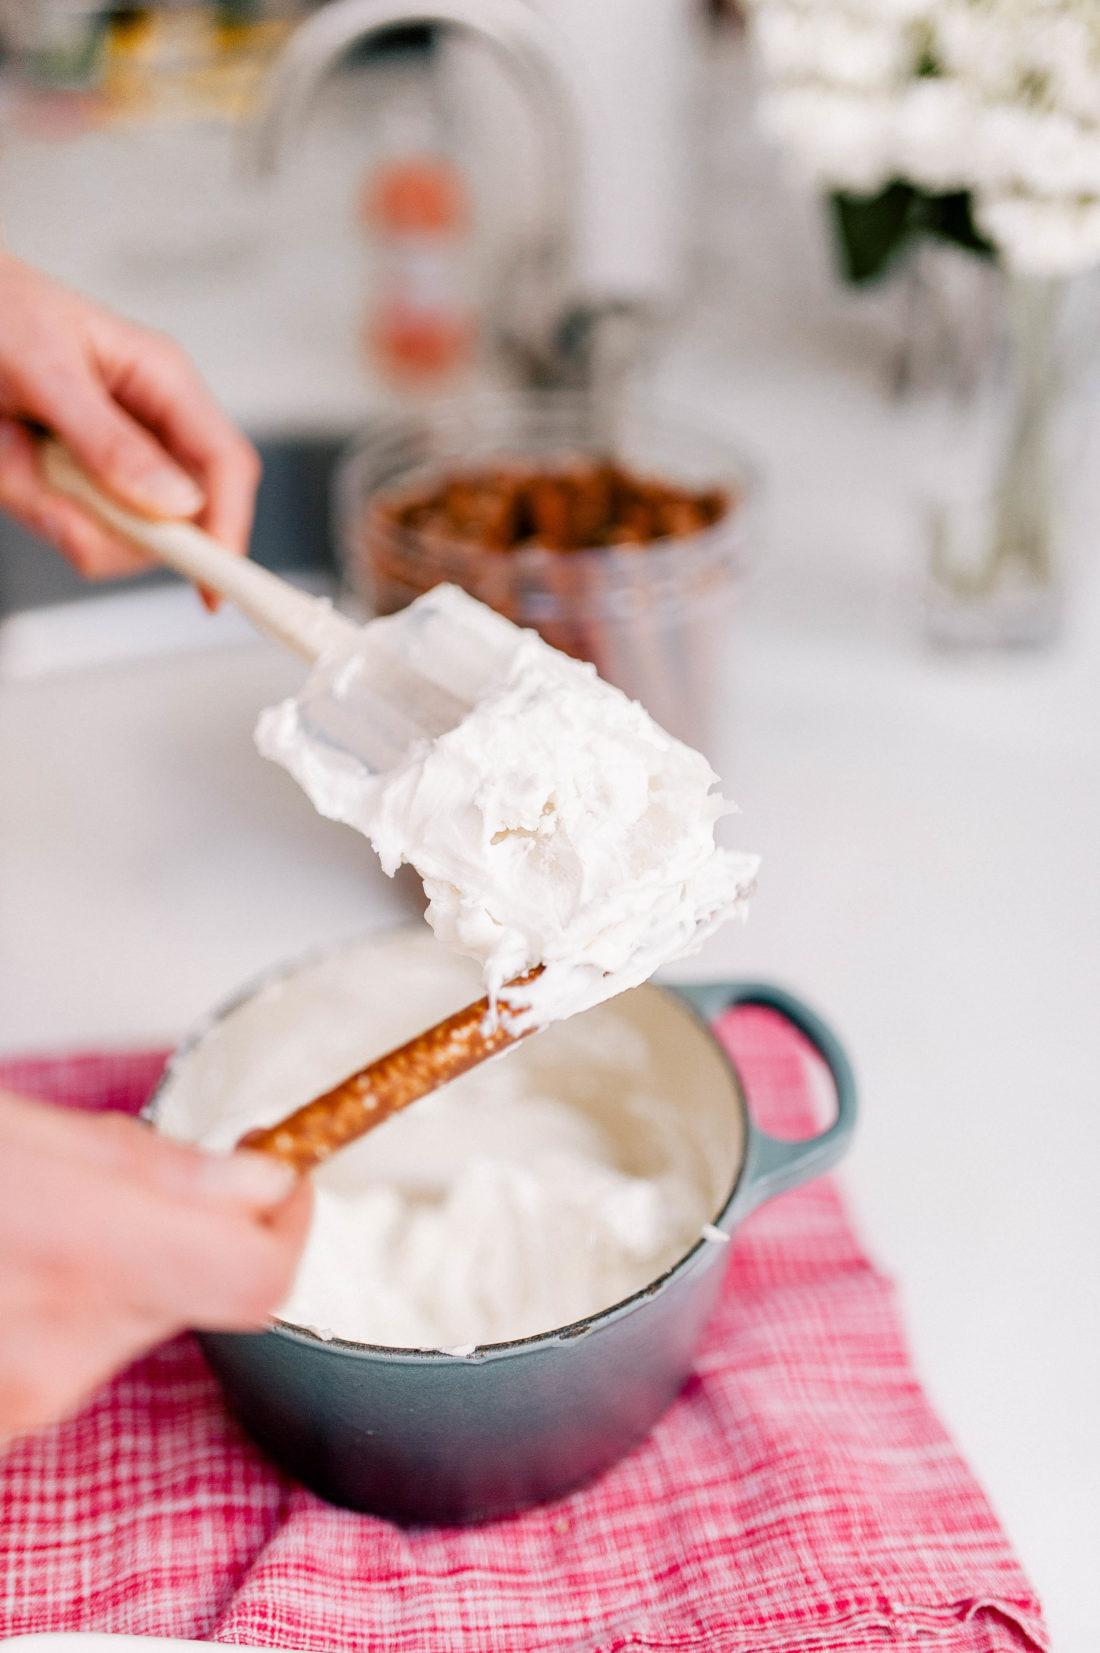 Eva Amurri Martino spreads white chocolate on a pretzel rod as part of a Valentine's Day treat